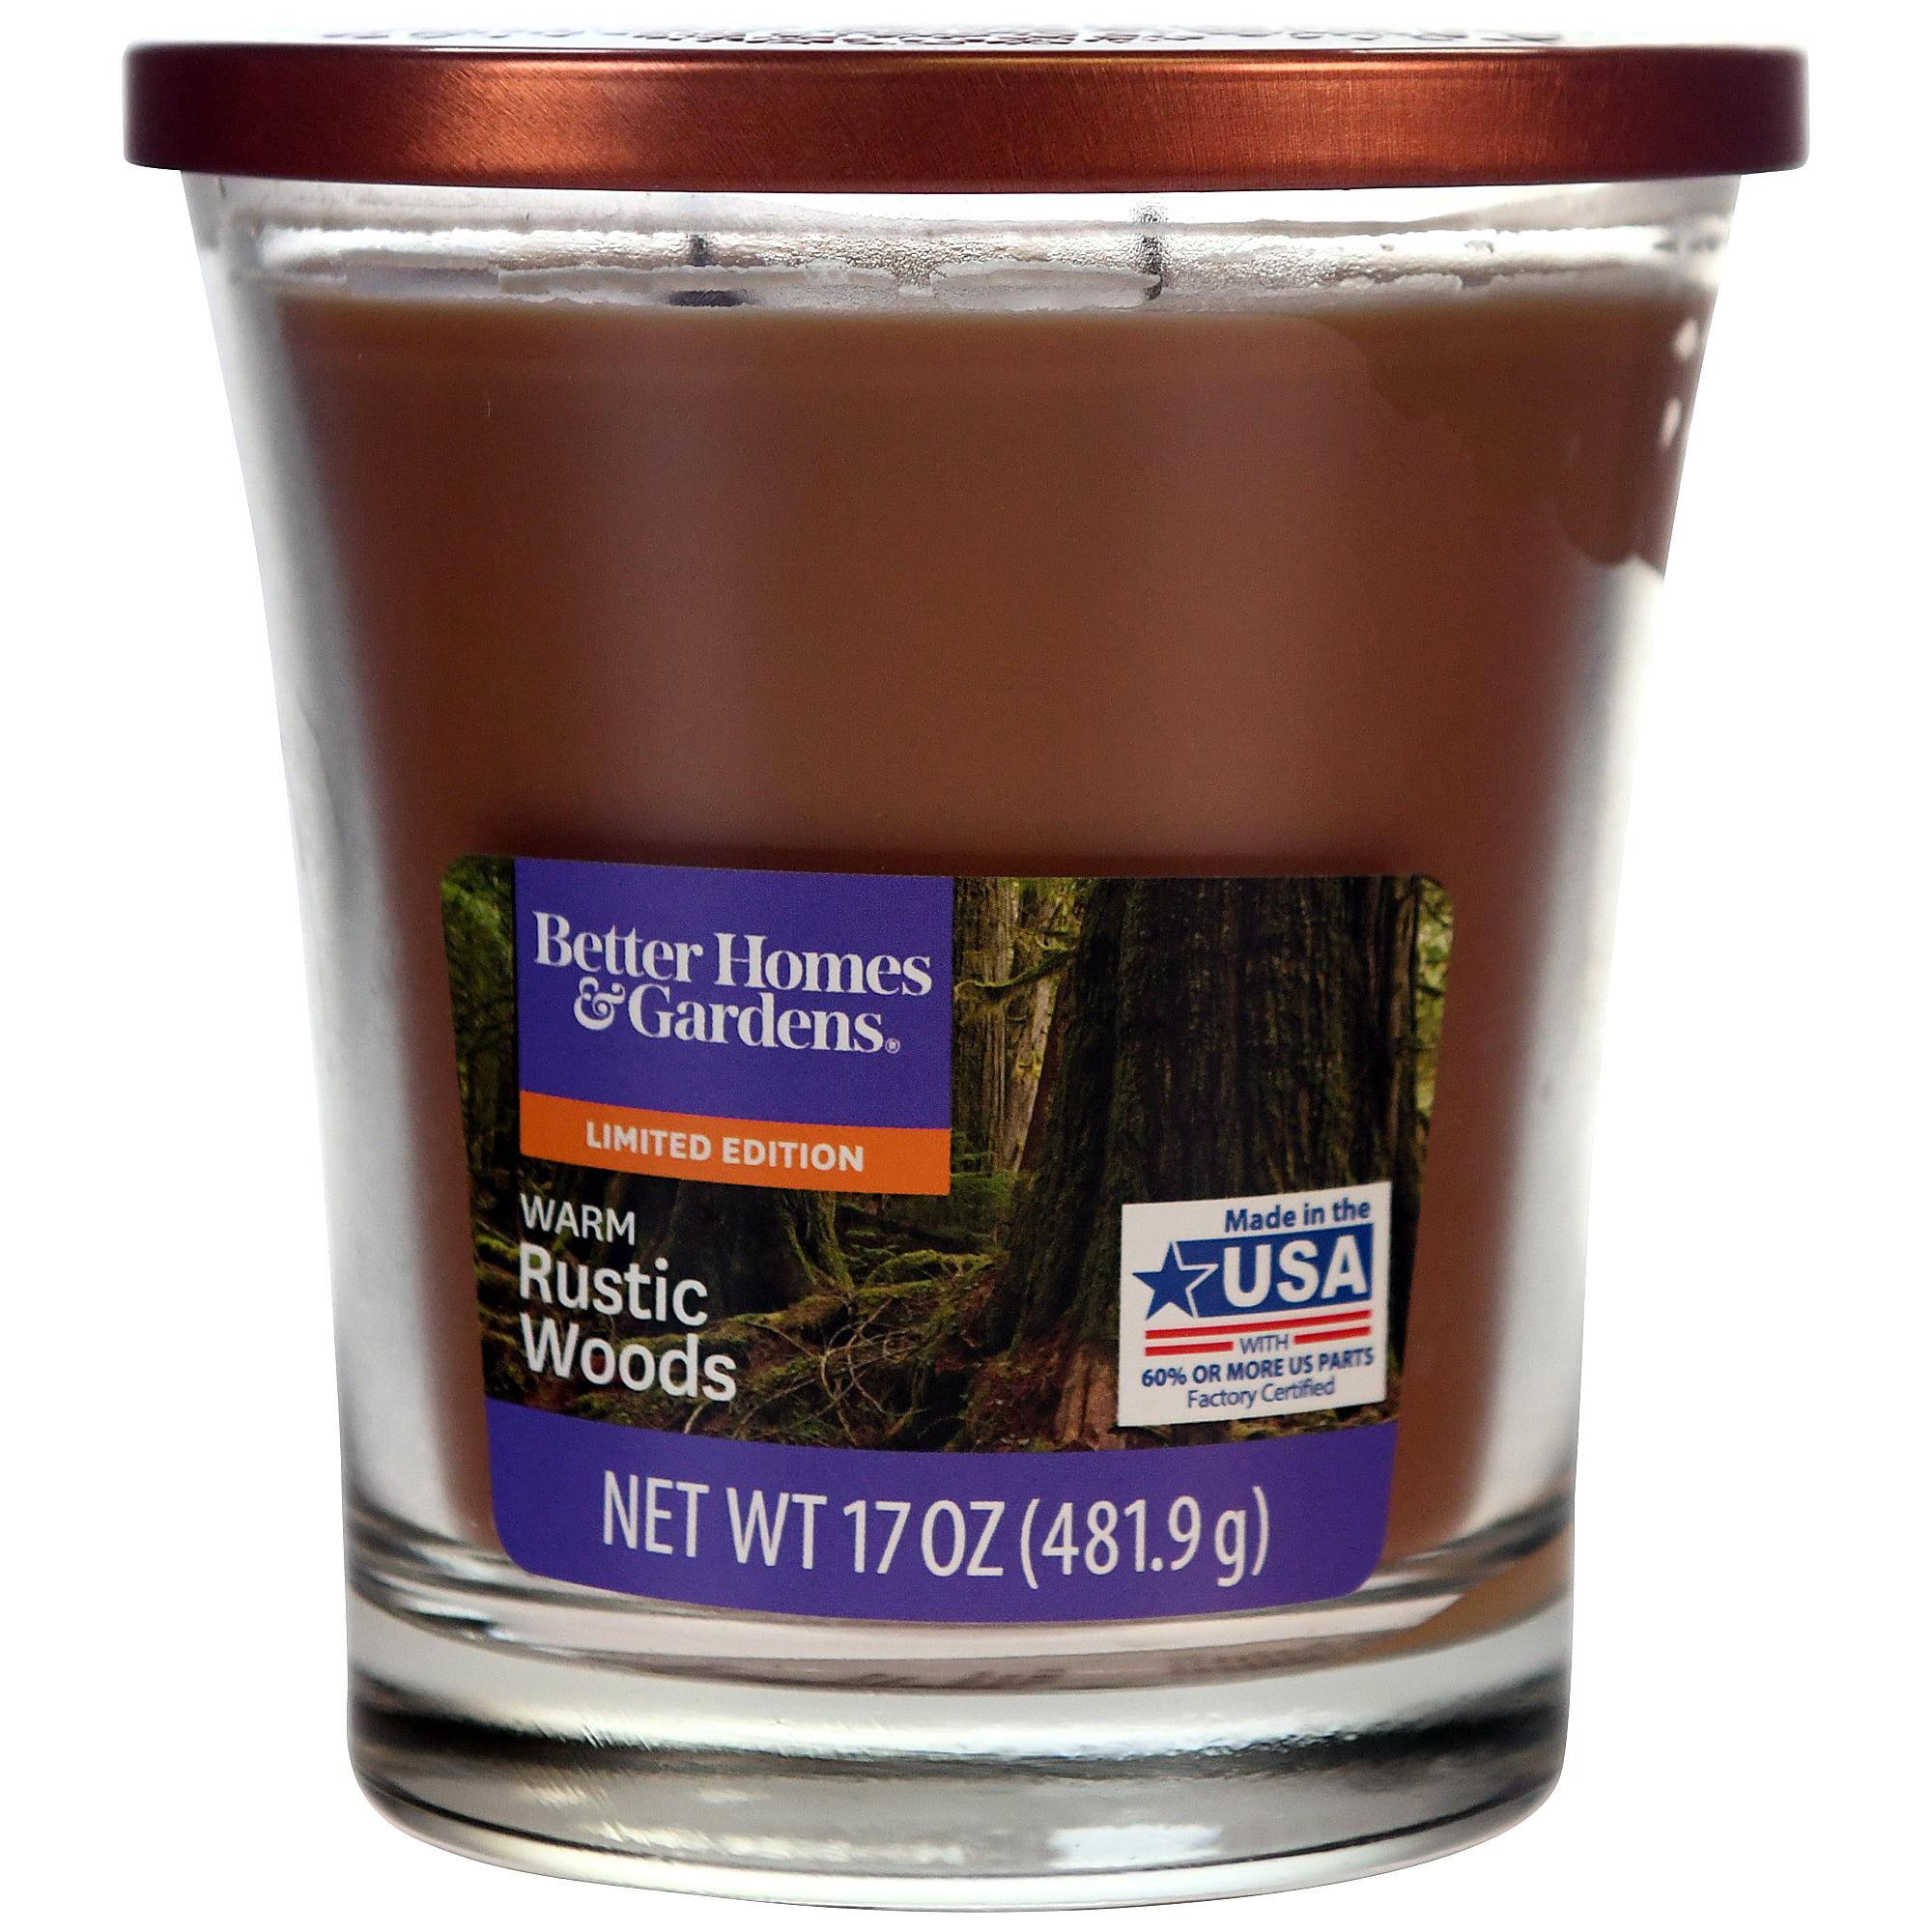 Better Homes&gardens Bhg 17oz Warm Rustic Wood Copper Lid Jar